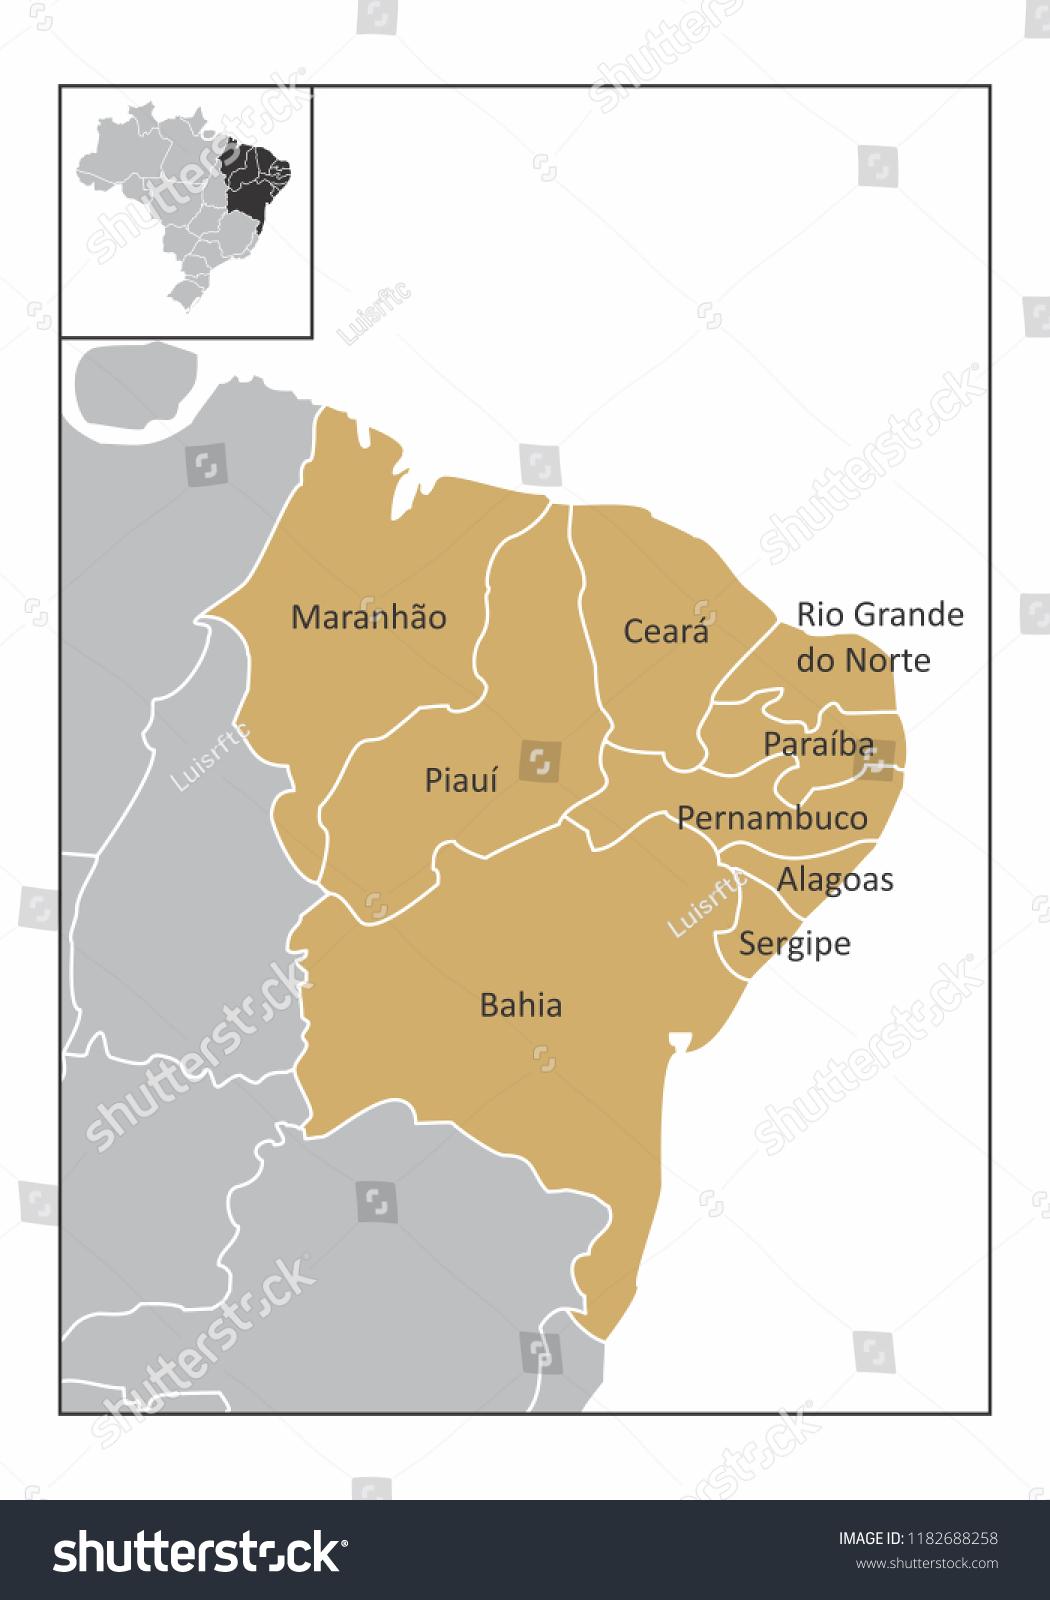 Picture of: Ilustracion De Stock Sobre Map Northeast Region Brazil Identified States 1182688258